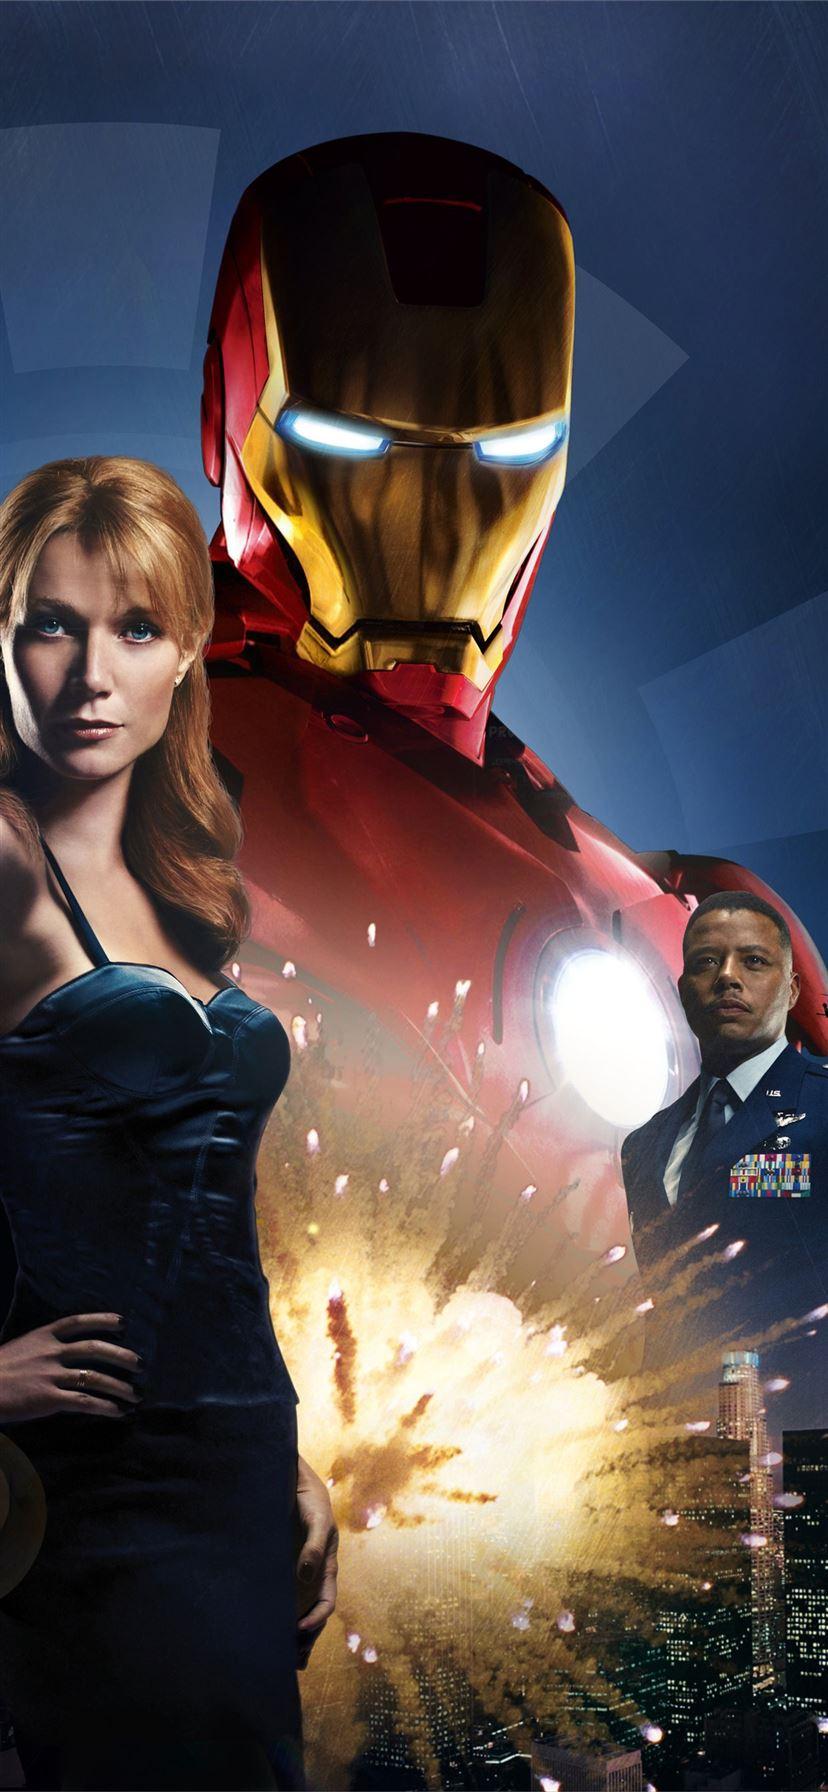 Iron Man 2008 Iphone 11 Wallpapers Free Download